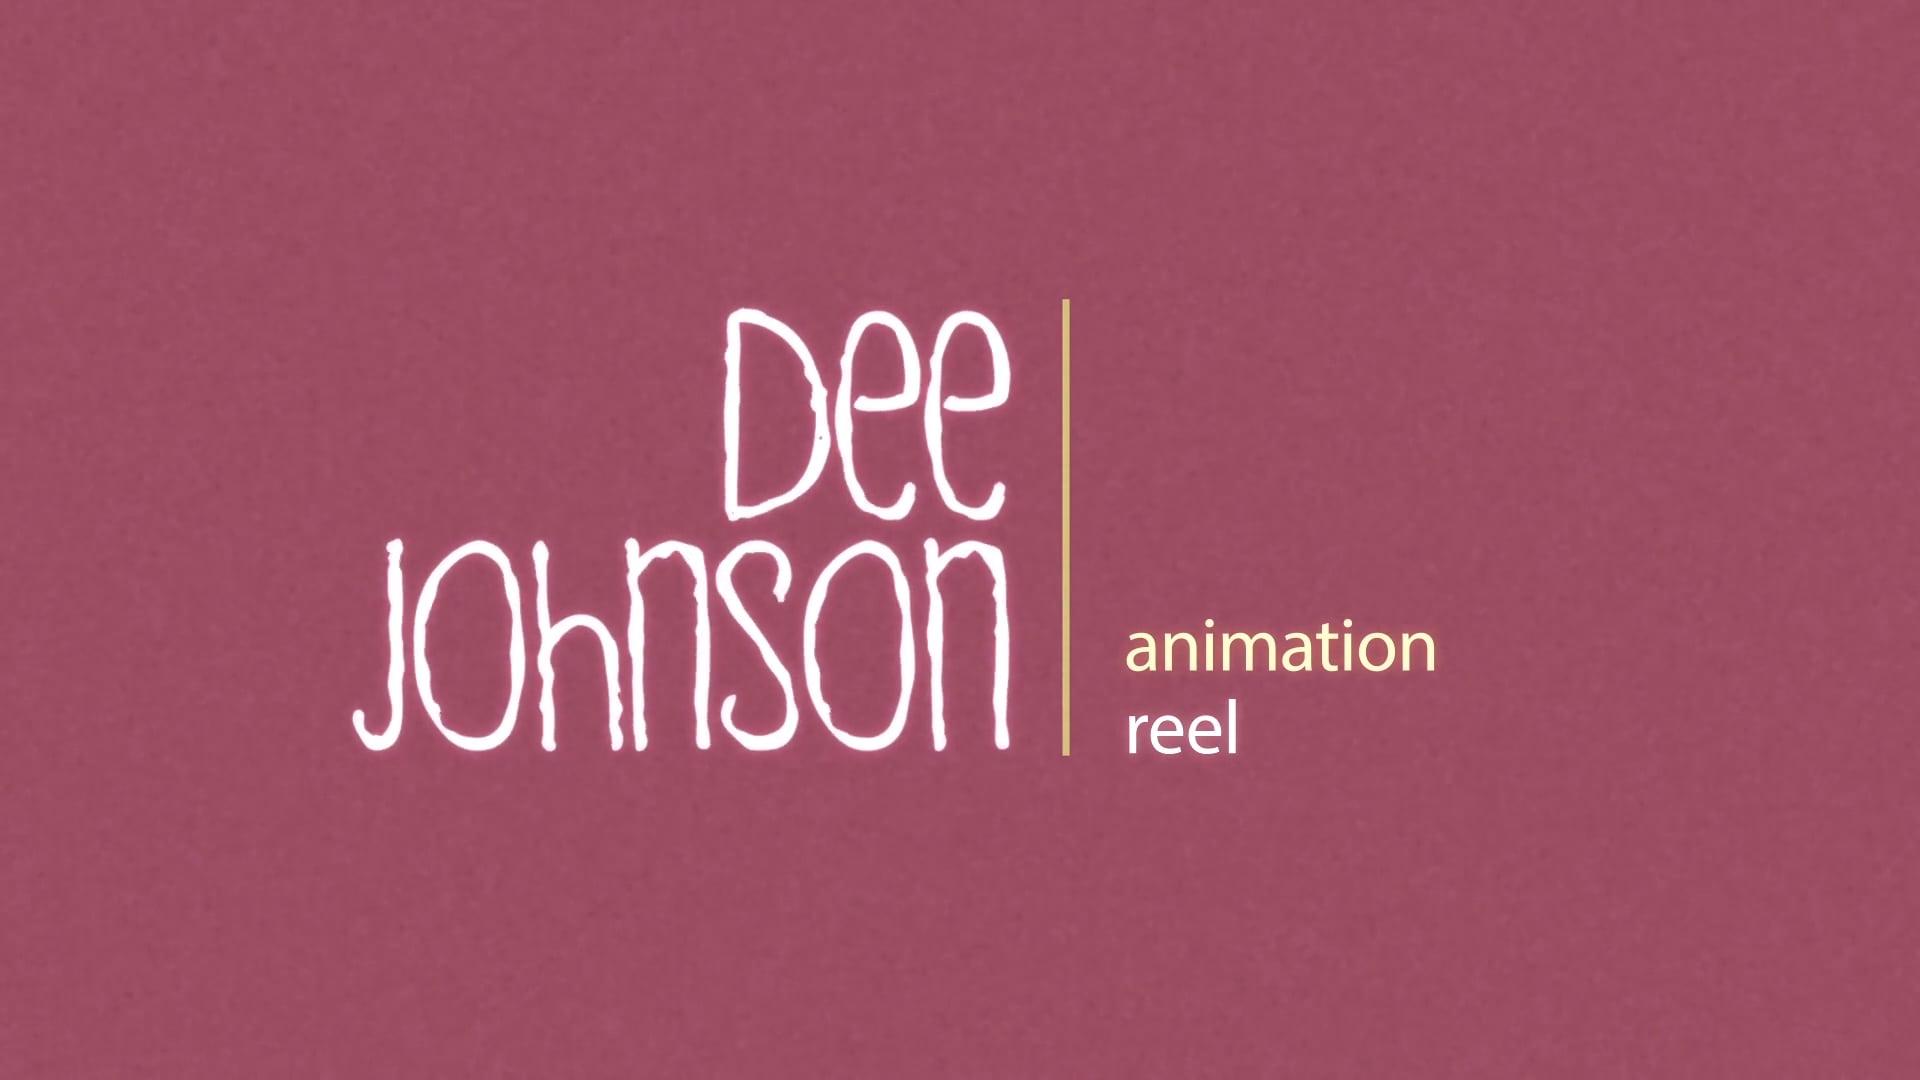 Danielle Johnson 2D Animation Reel